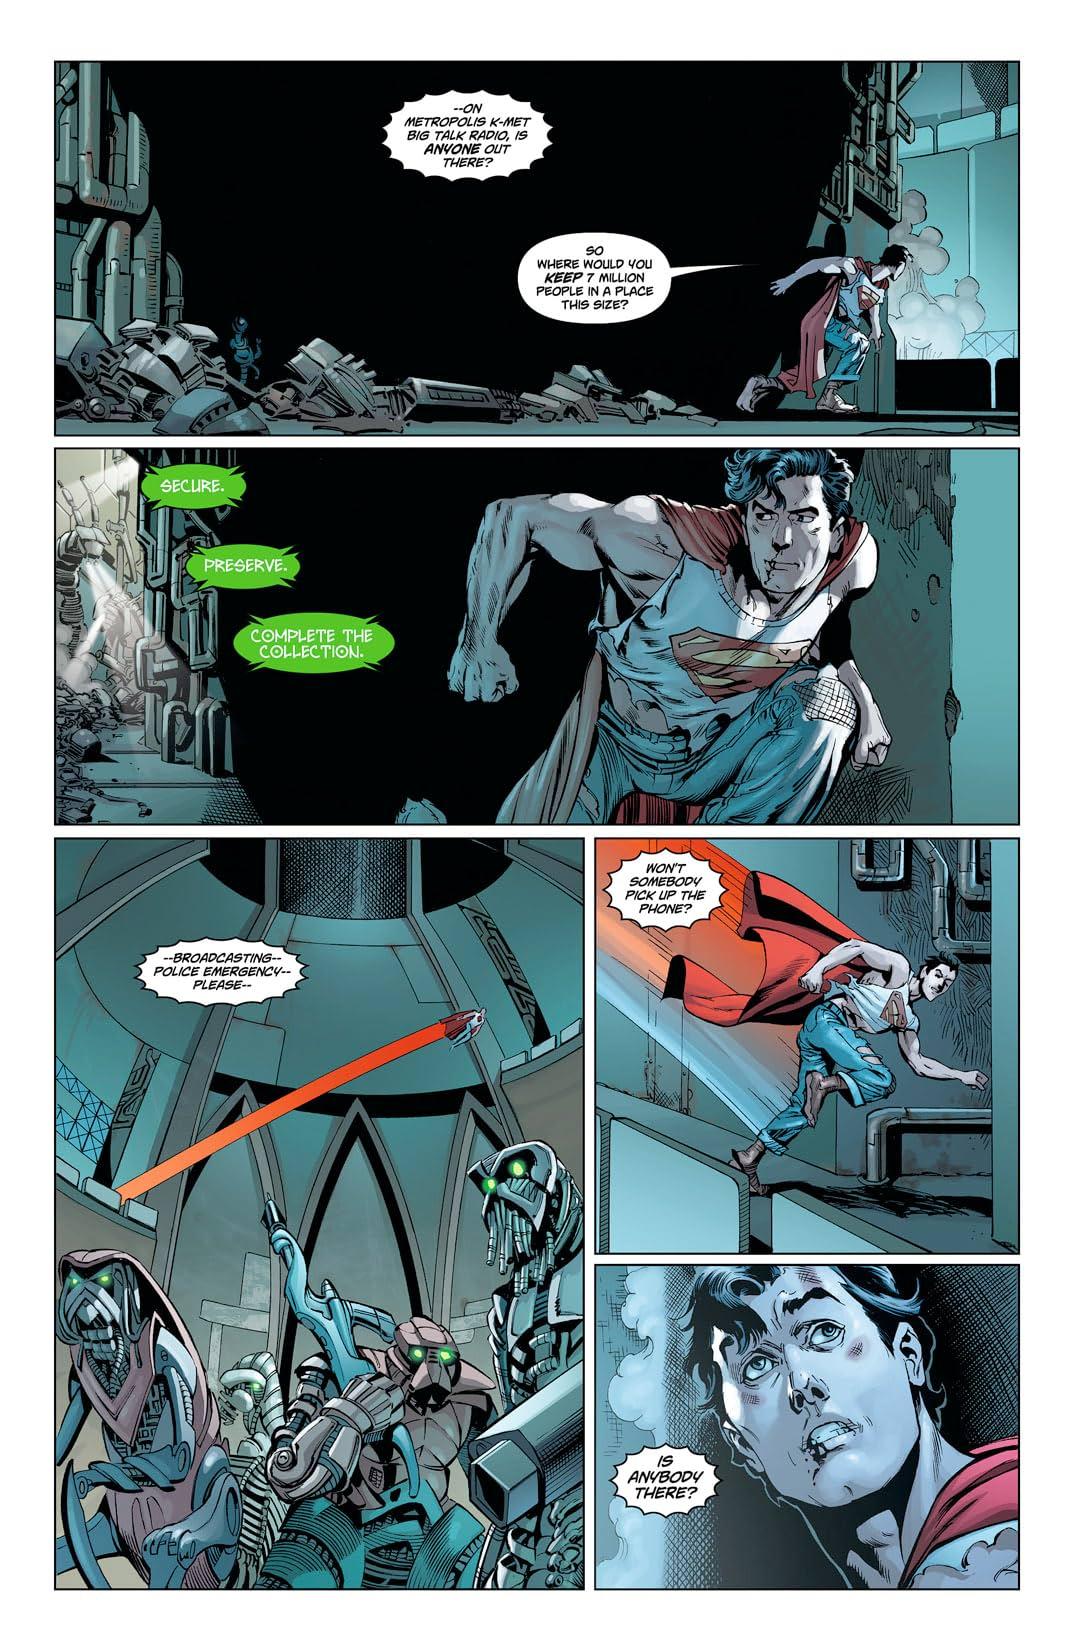 Action Comics (2011-) #7